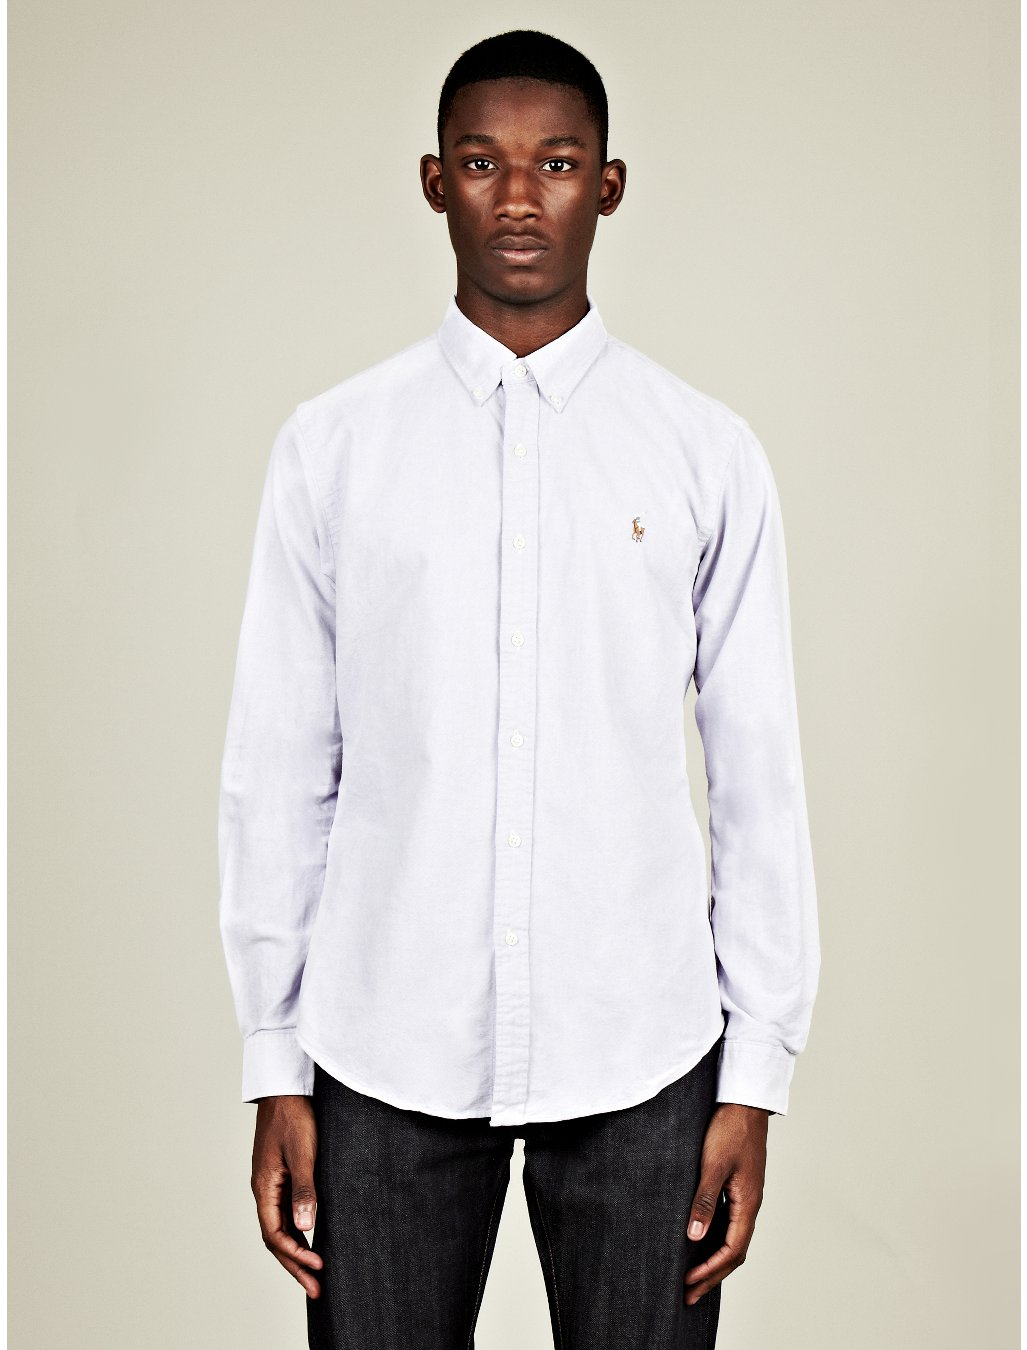 6fbd8469bd17 Polo Ralph Lauren Mens Slim Fit Button Down Oxford Shirt in Blue for Men  (purple